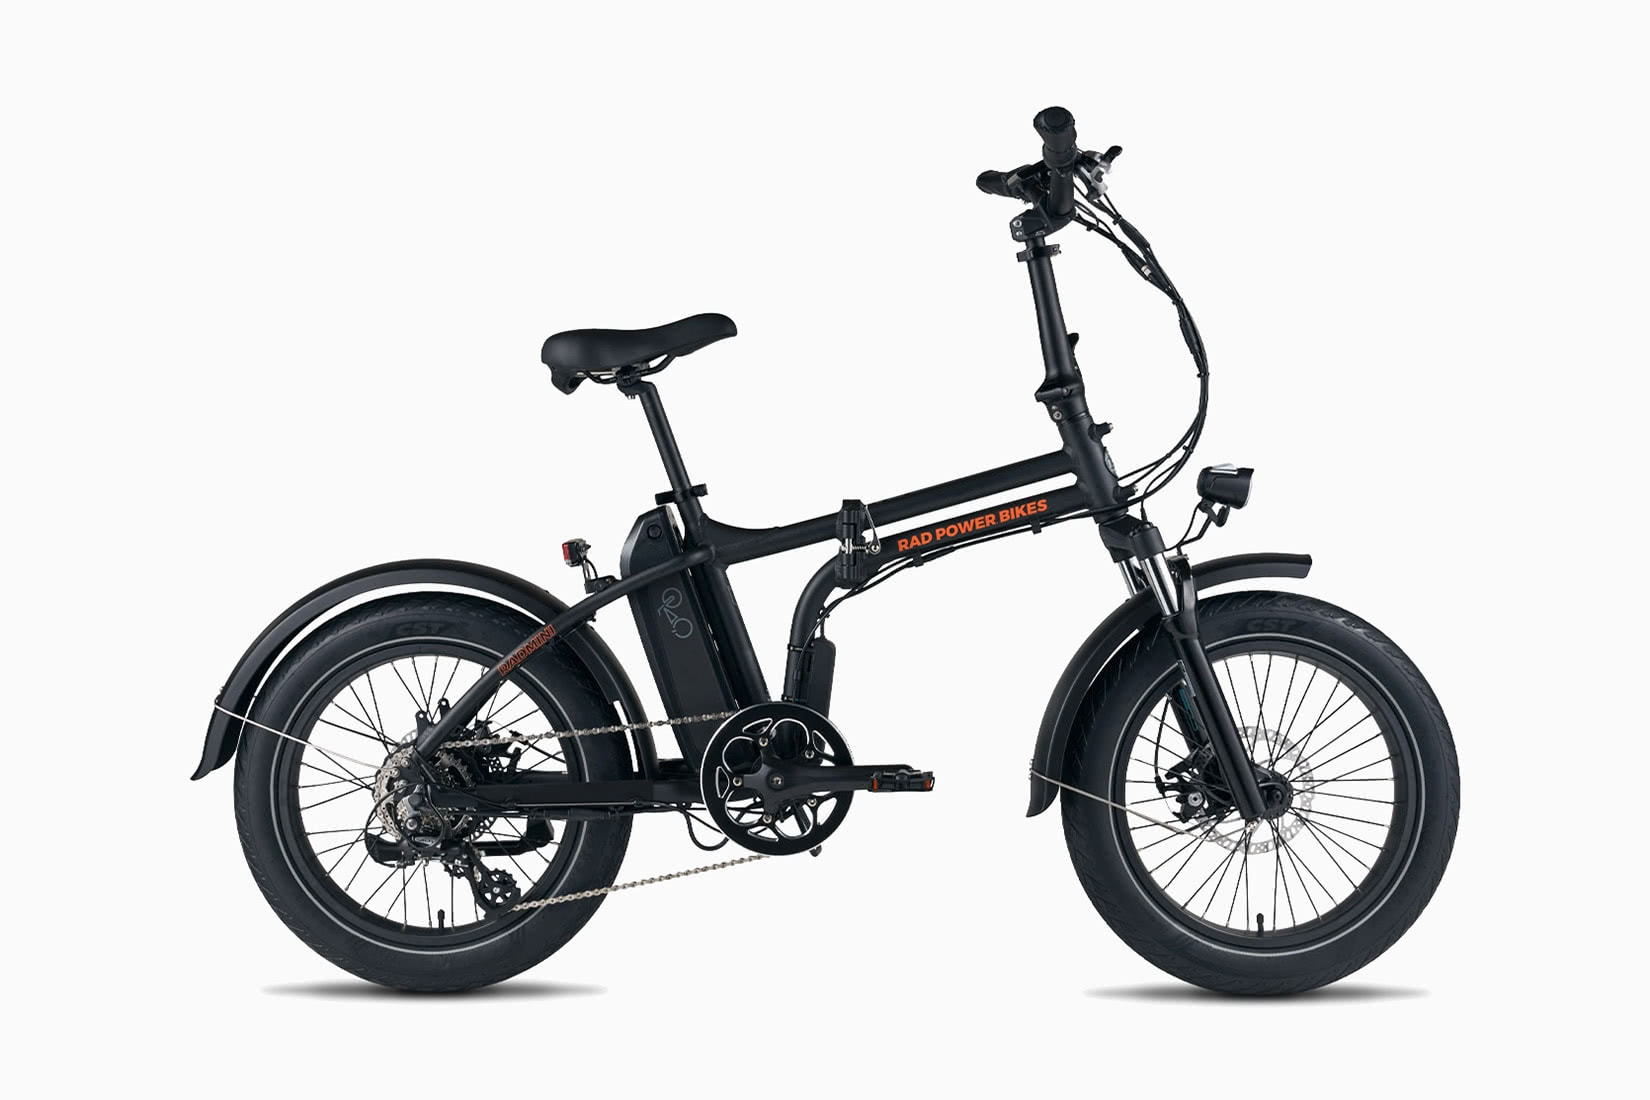 best electric bikes beach radmini 4 review - Luxe Digital